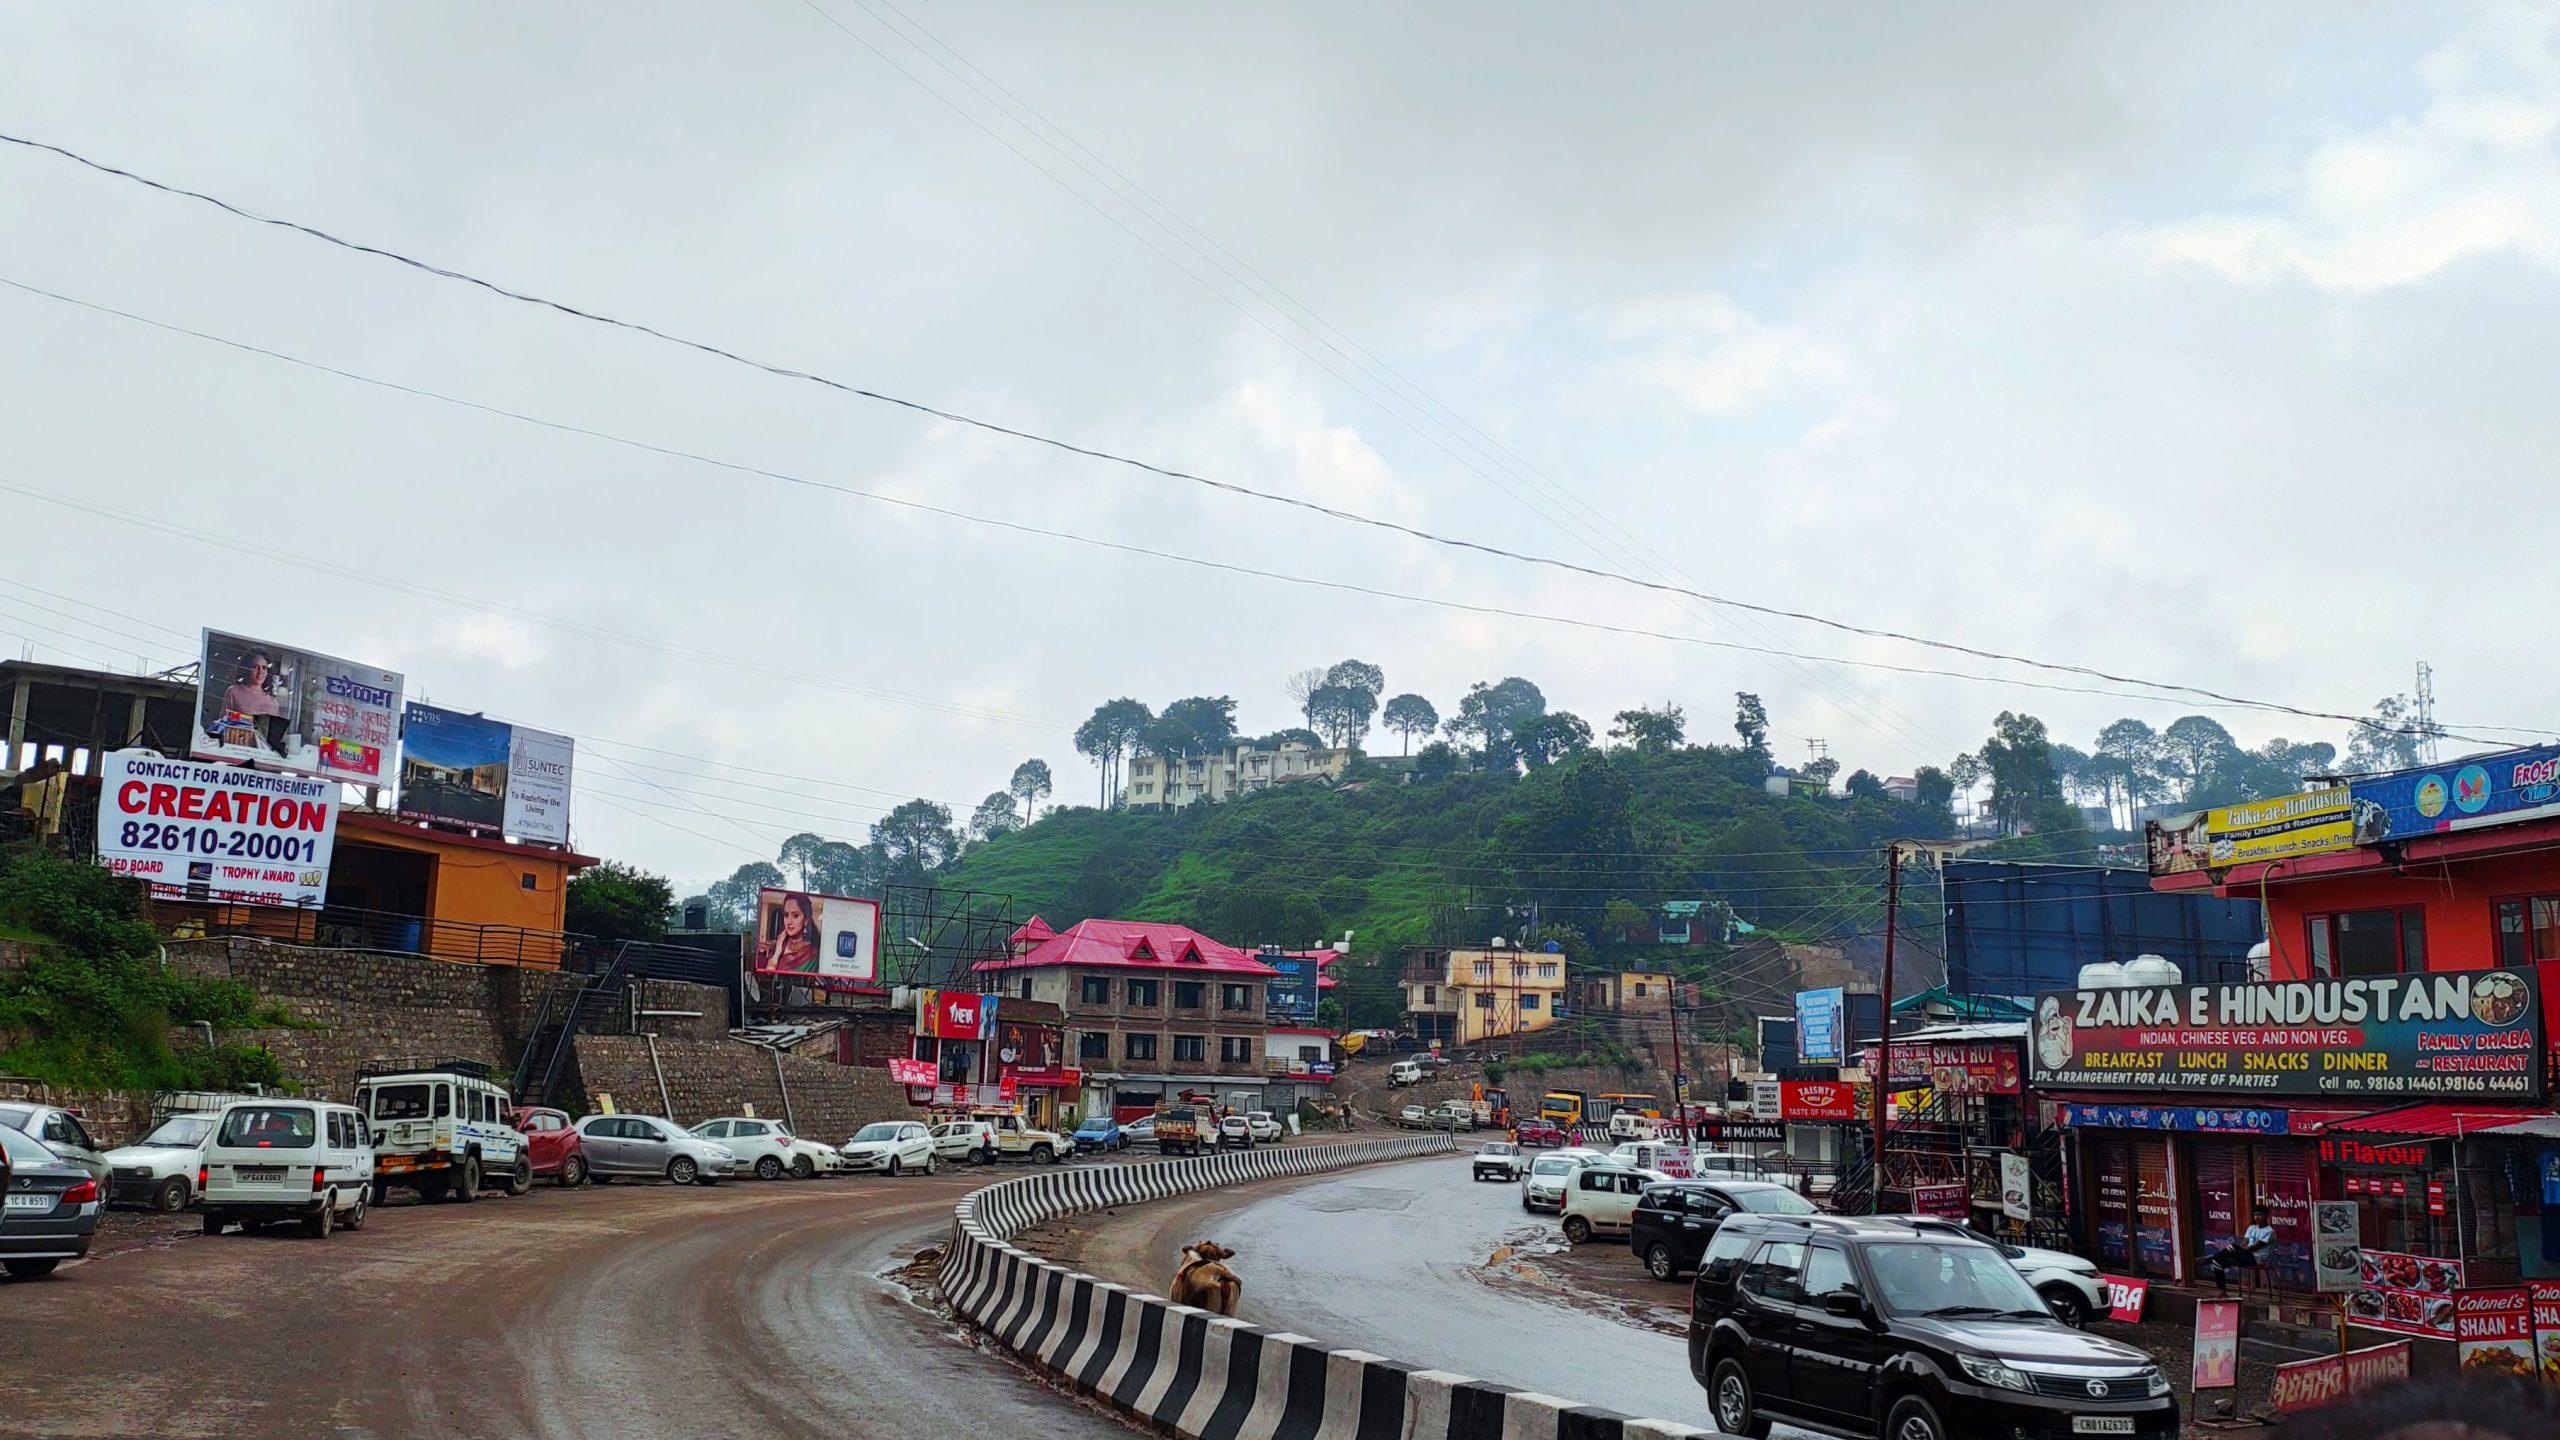 Hill street market